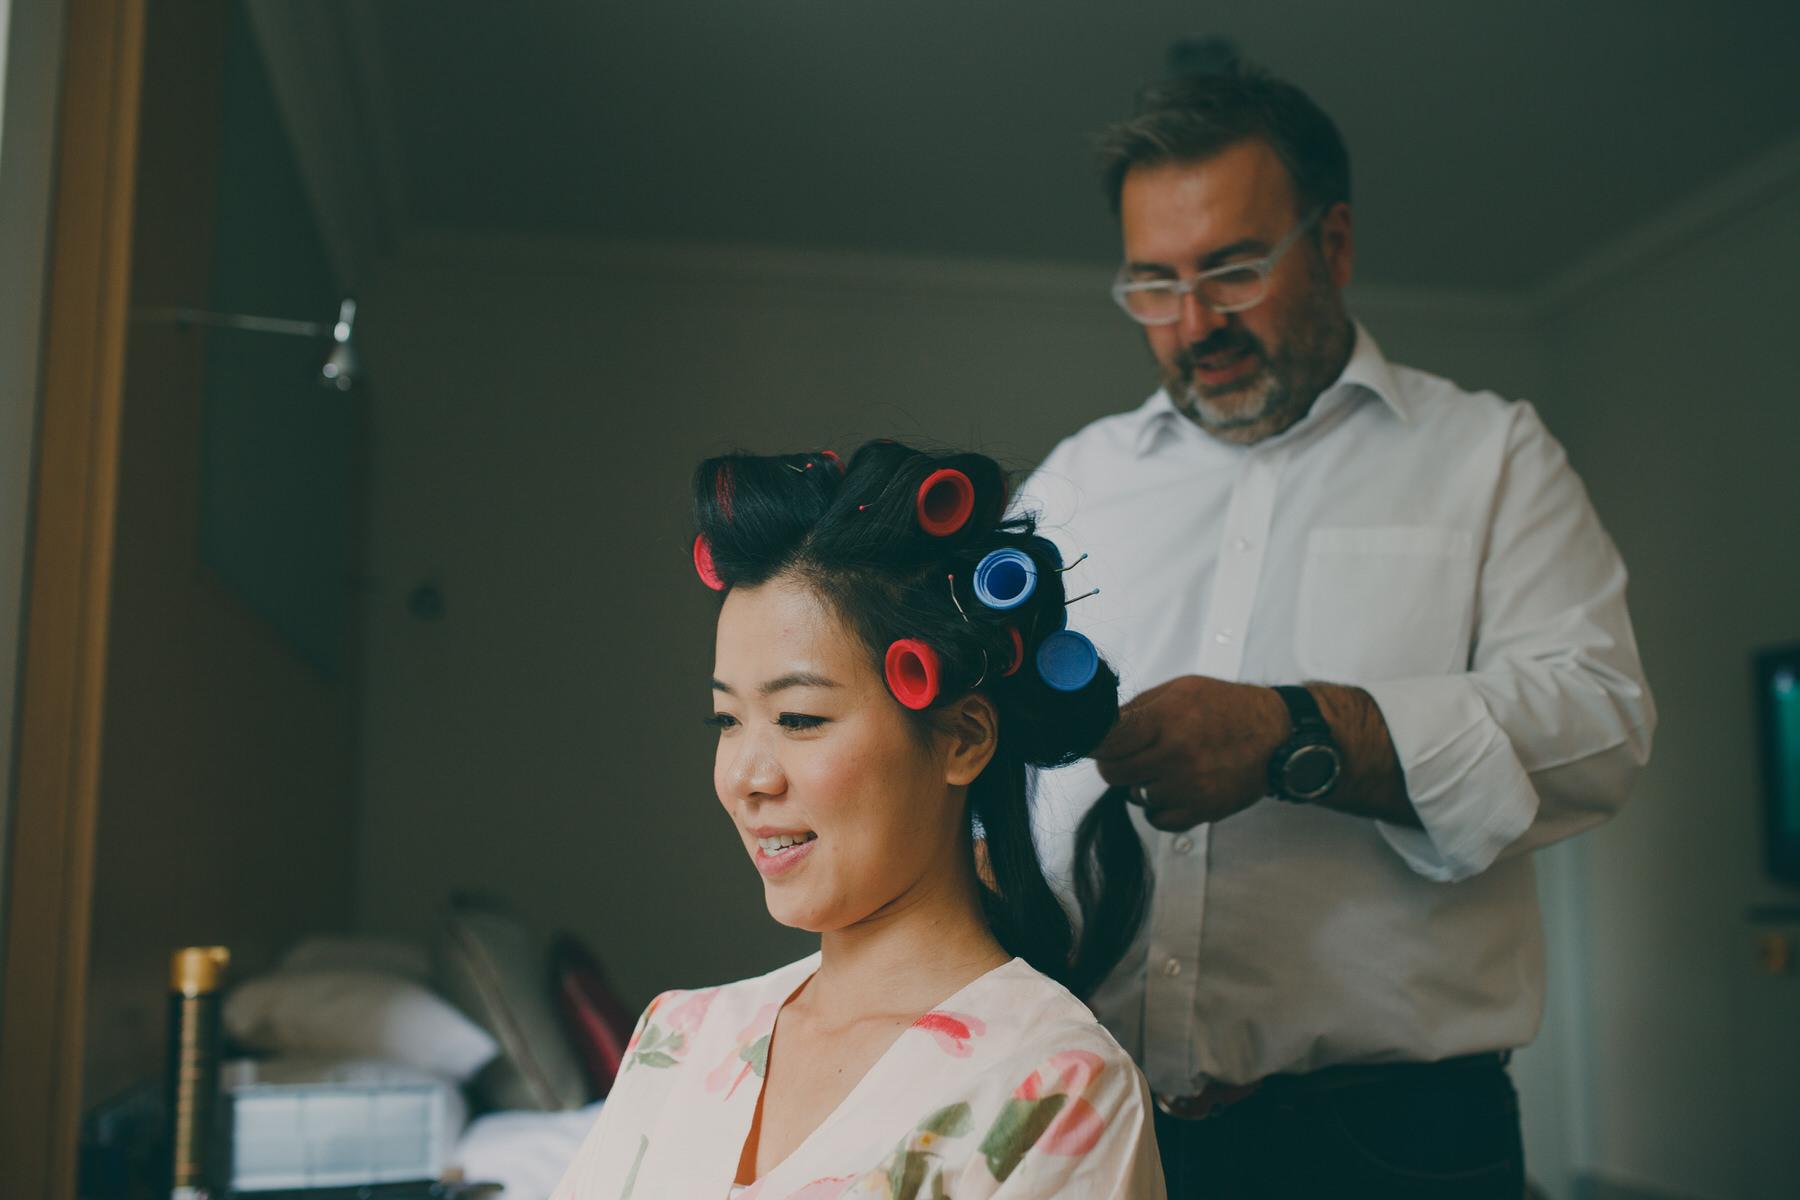 20 Woodlands Hotel Severin Hubert doing brides hair.jpg